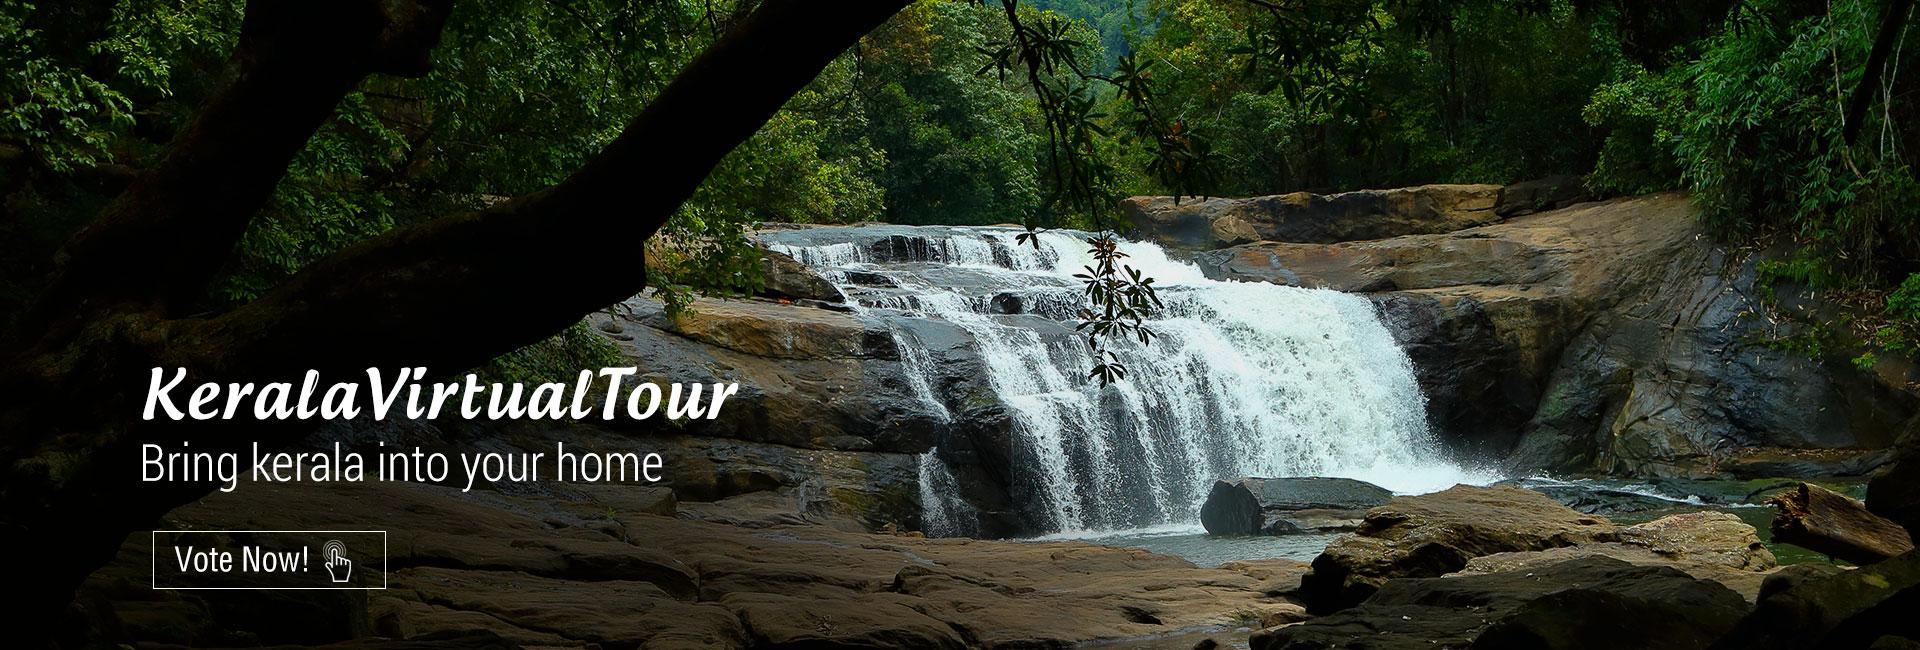 Kerala Virtual Tour - Waterfalls